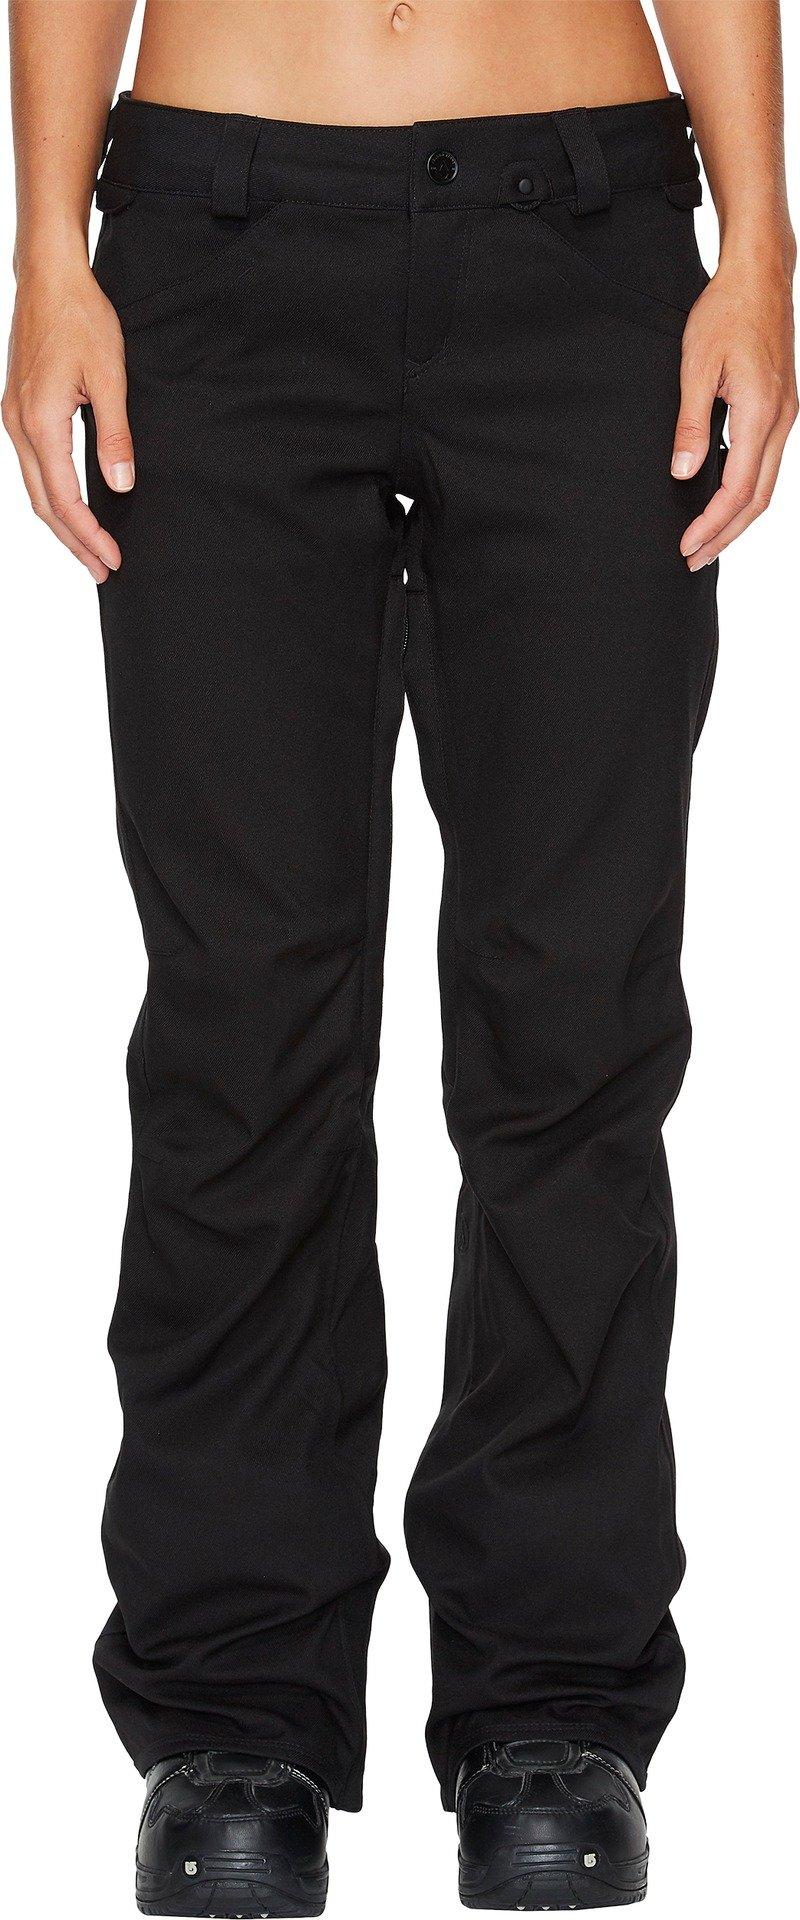 Volcom Snow Women's Species Stretch Pants Black XX-Small by Volcom